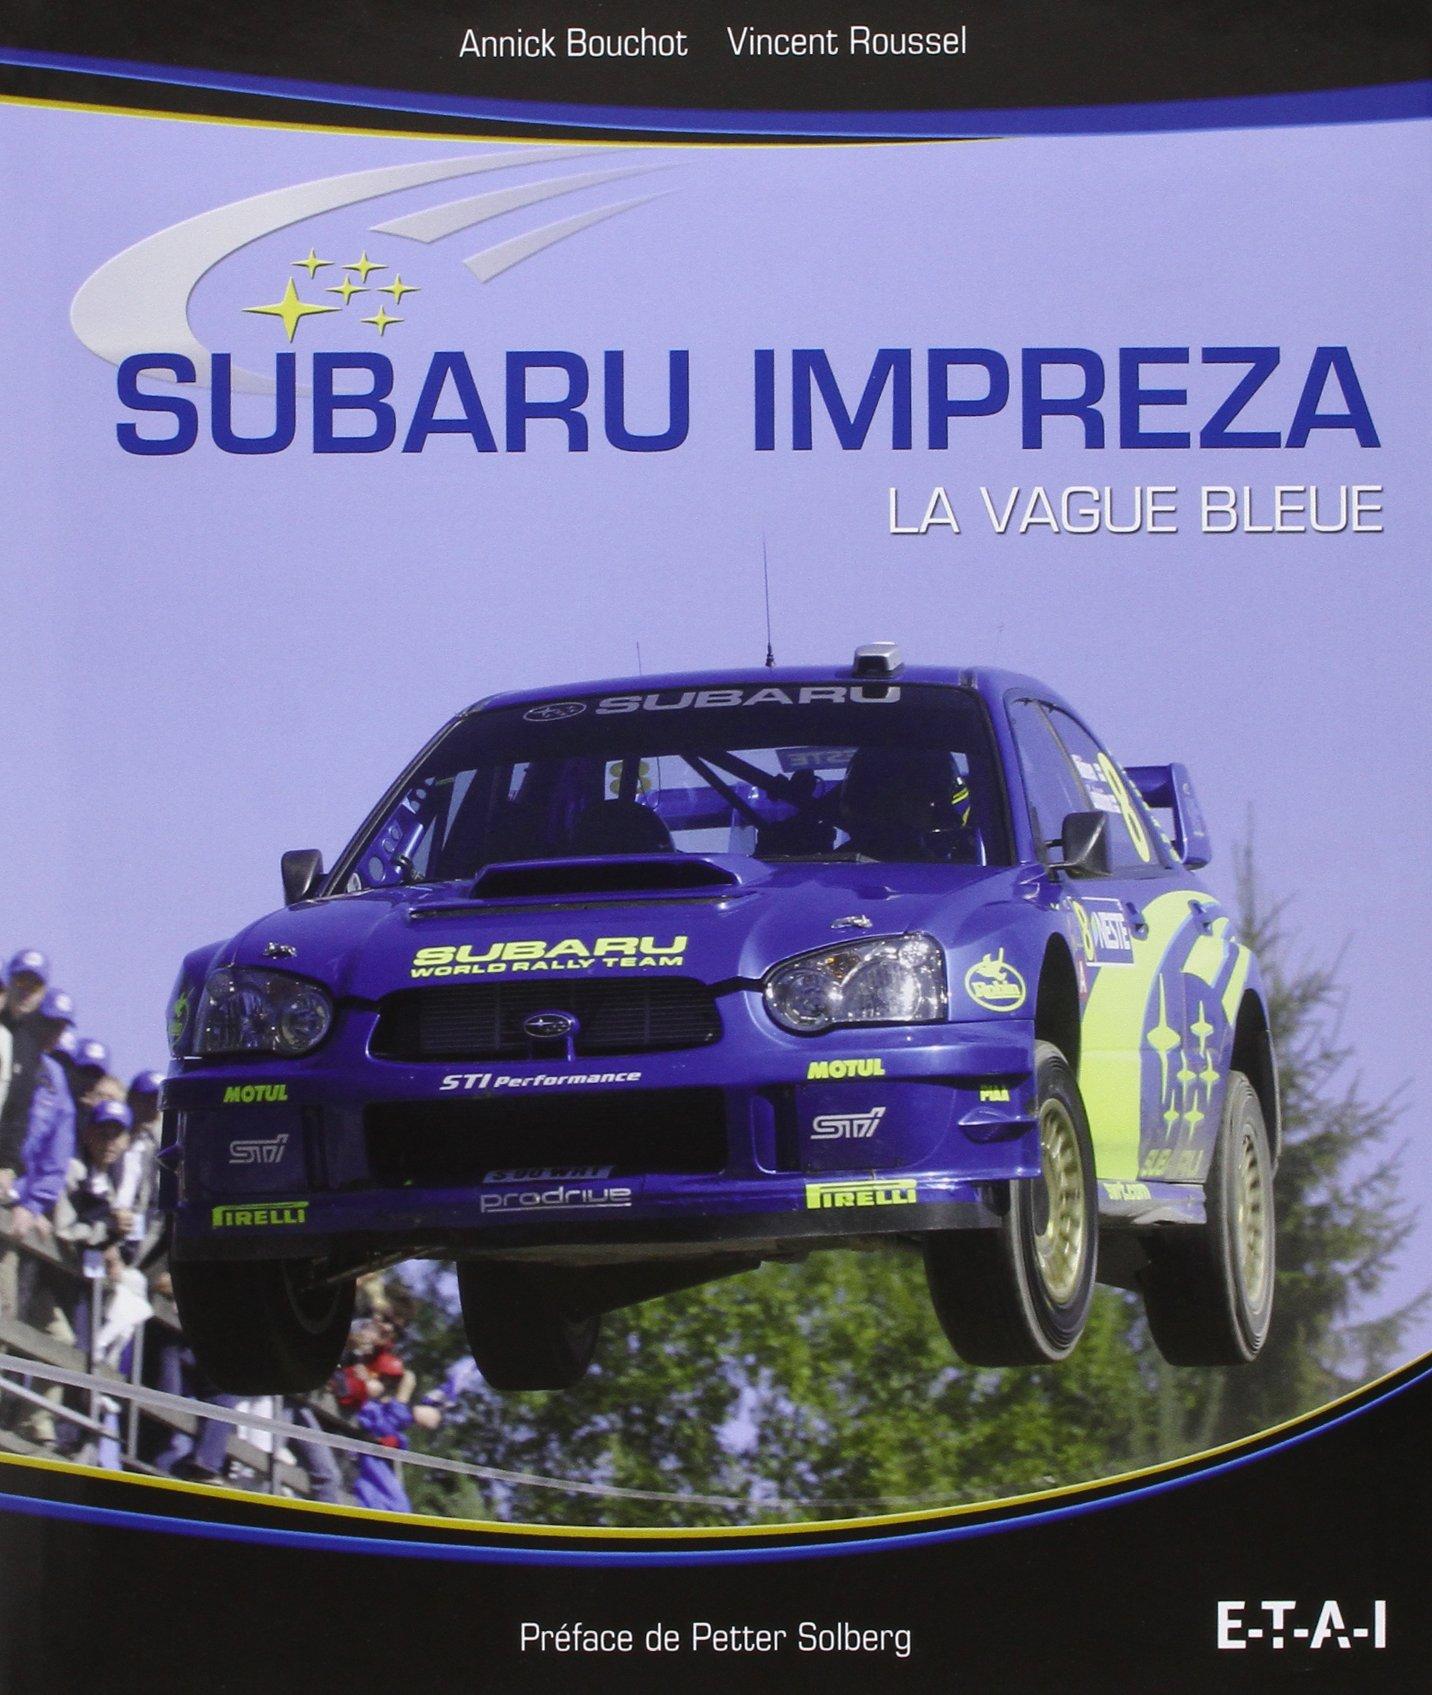 Subaru Impreza : La vague bleue: Amazon.es: Vincent Roussel, Annick Bouchot, Petter Solberg: Libros en idiomas extranjeros